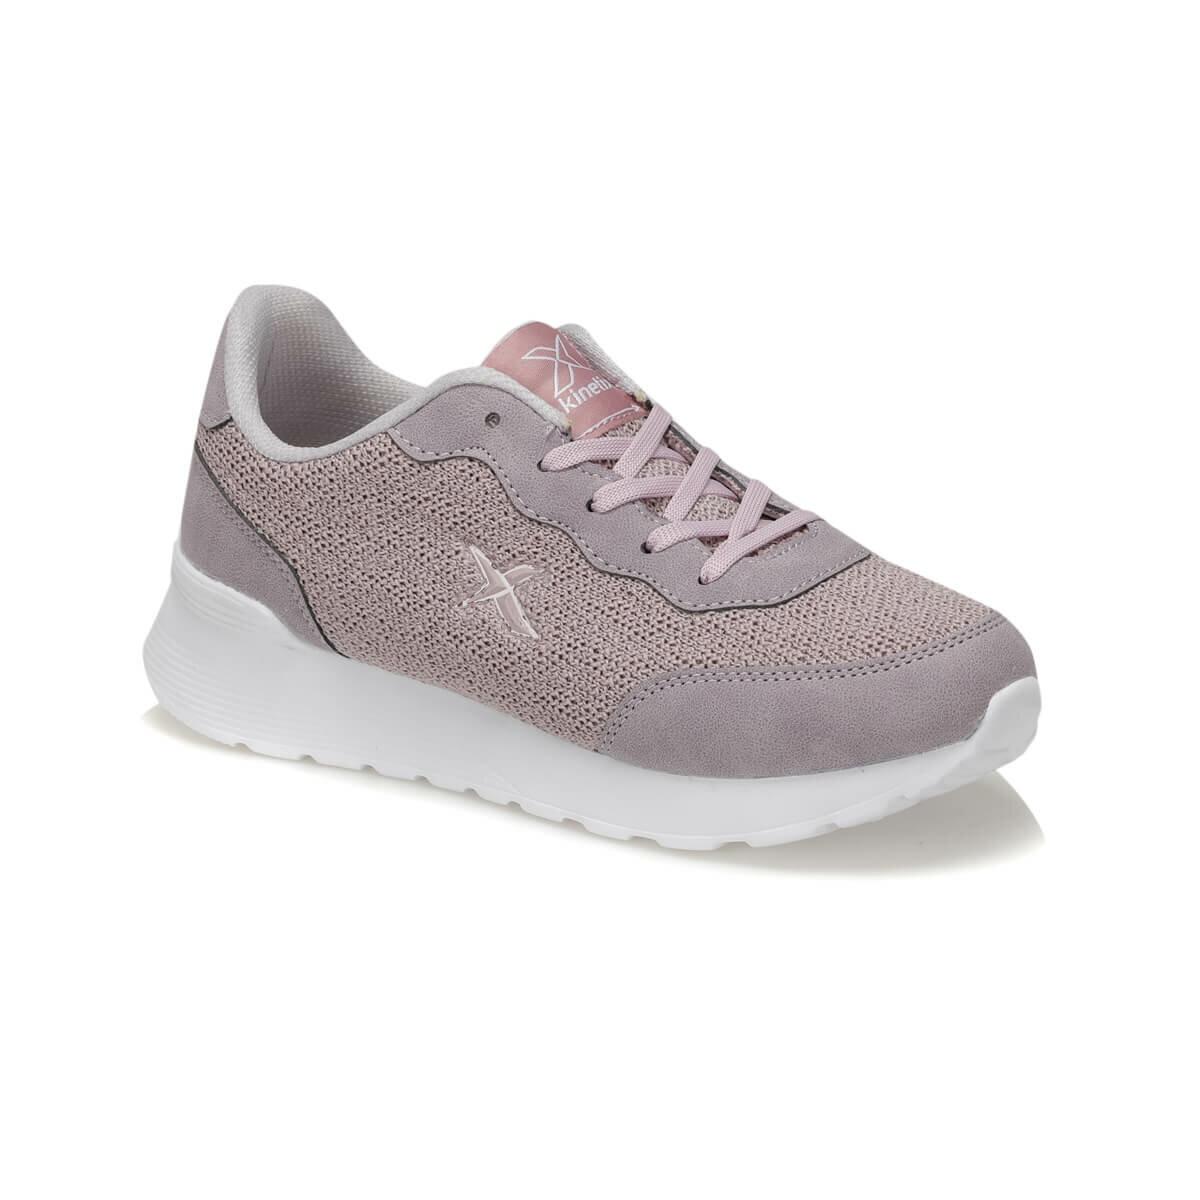 FLO PIN On W Lilac Women Sneaker SHOES KINETIX